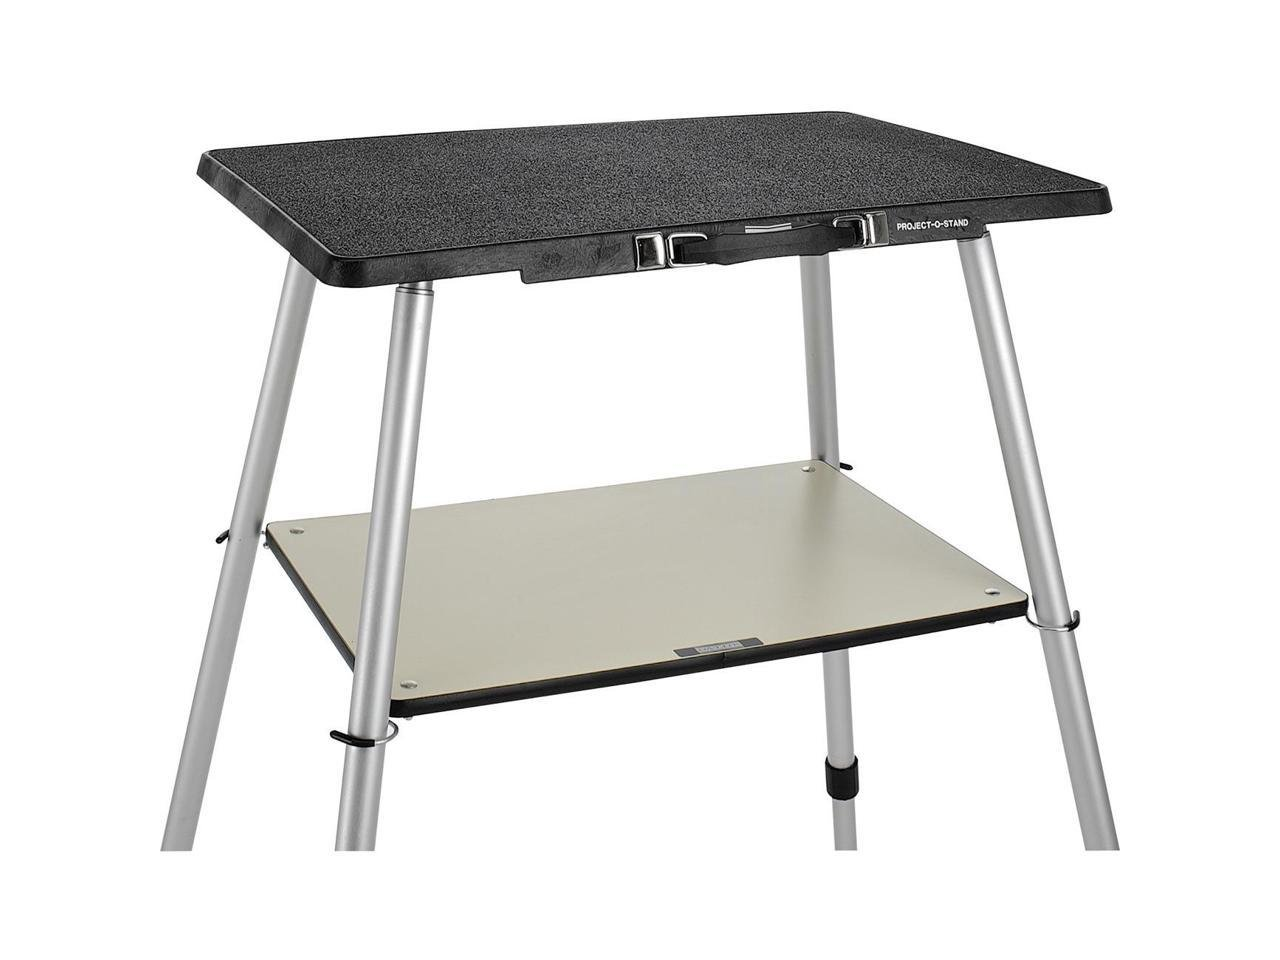 Da Lite Stand   Accessory Shelf for Projector Stand   20